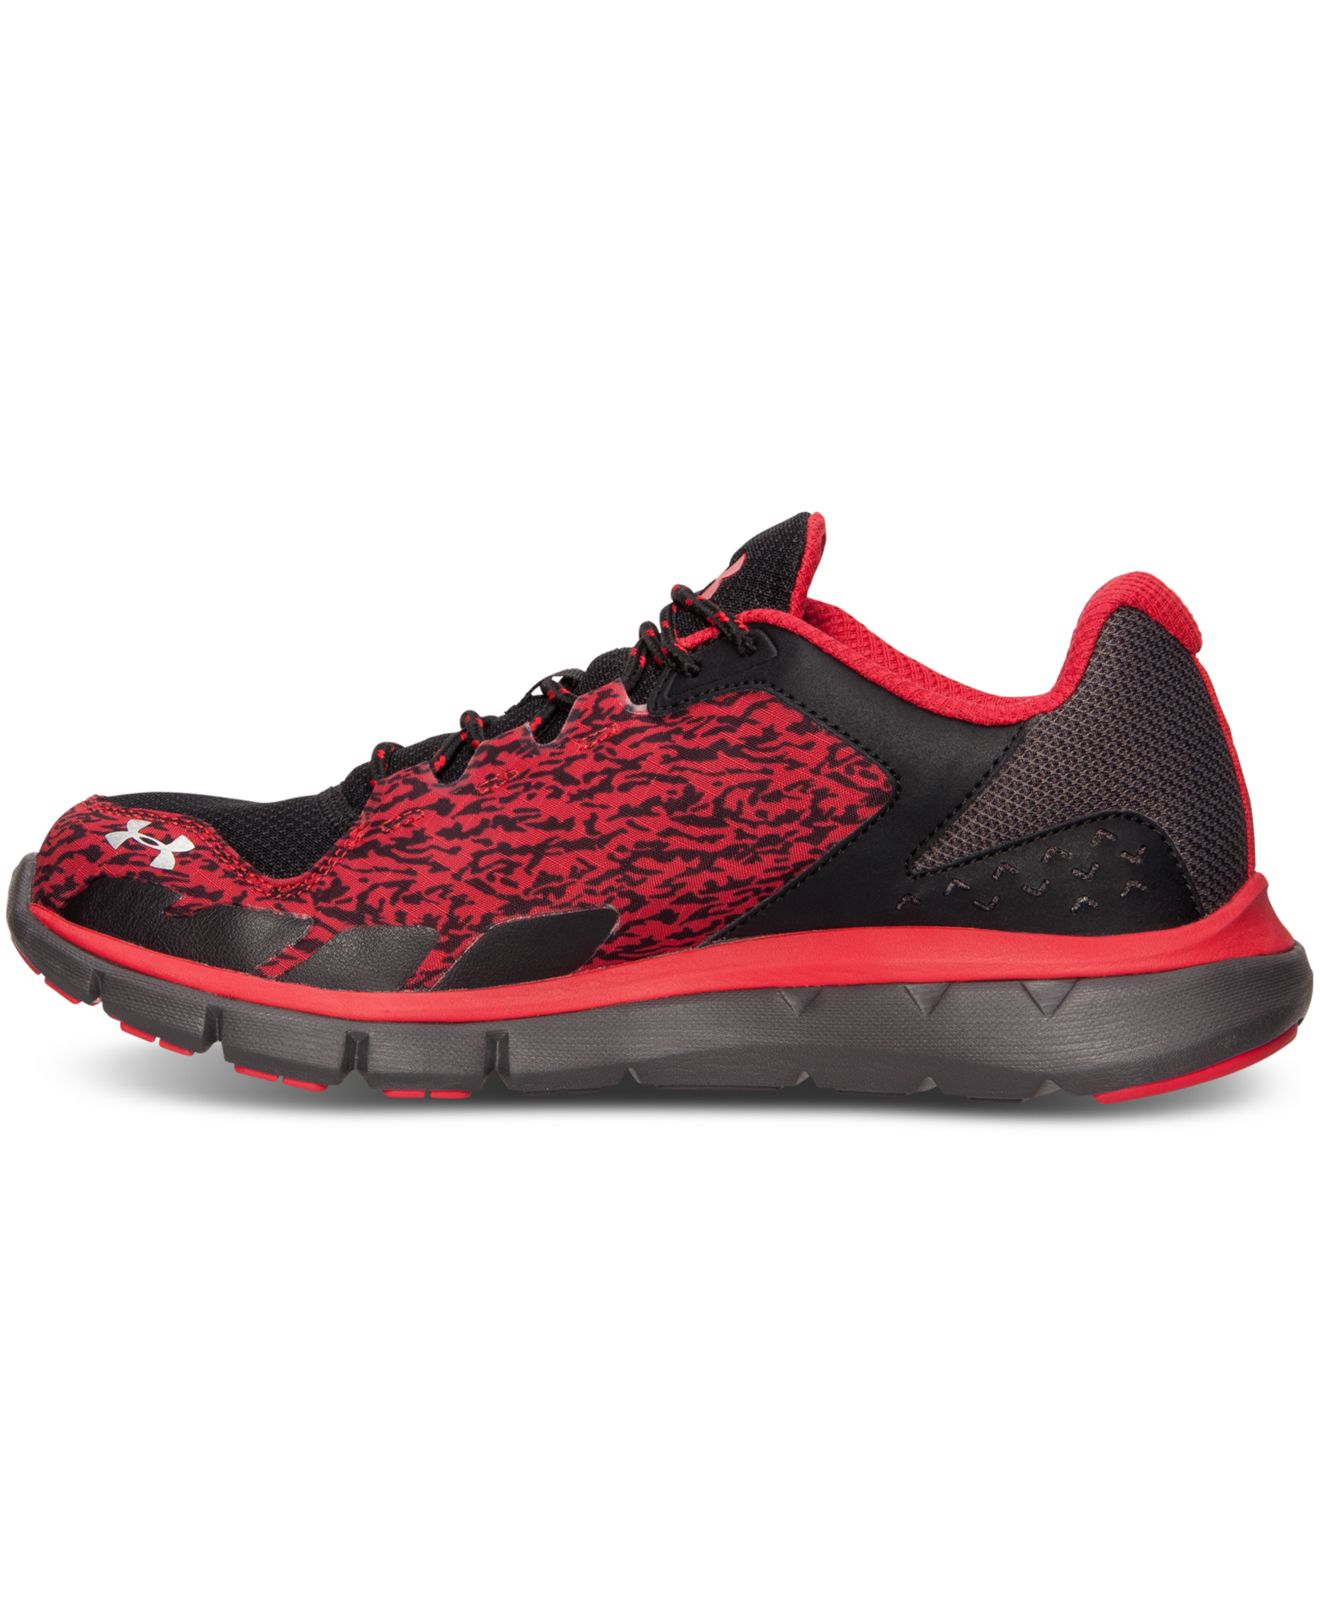 Lyst - Under Armour Men s Micro G Velocity Storm Running Sneakers ... fcf28ec0da3d